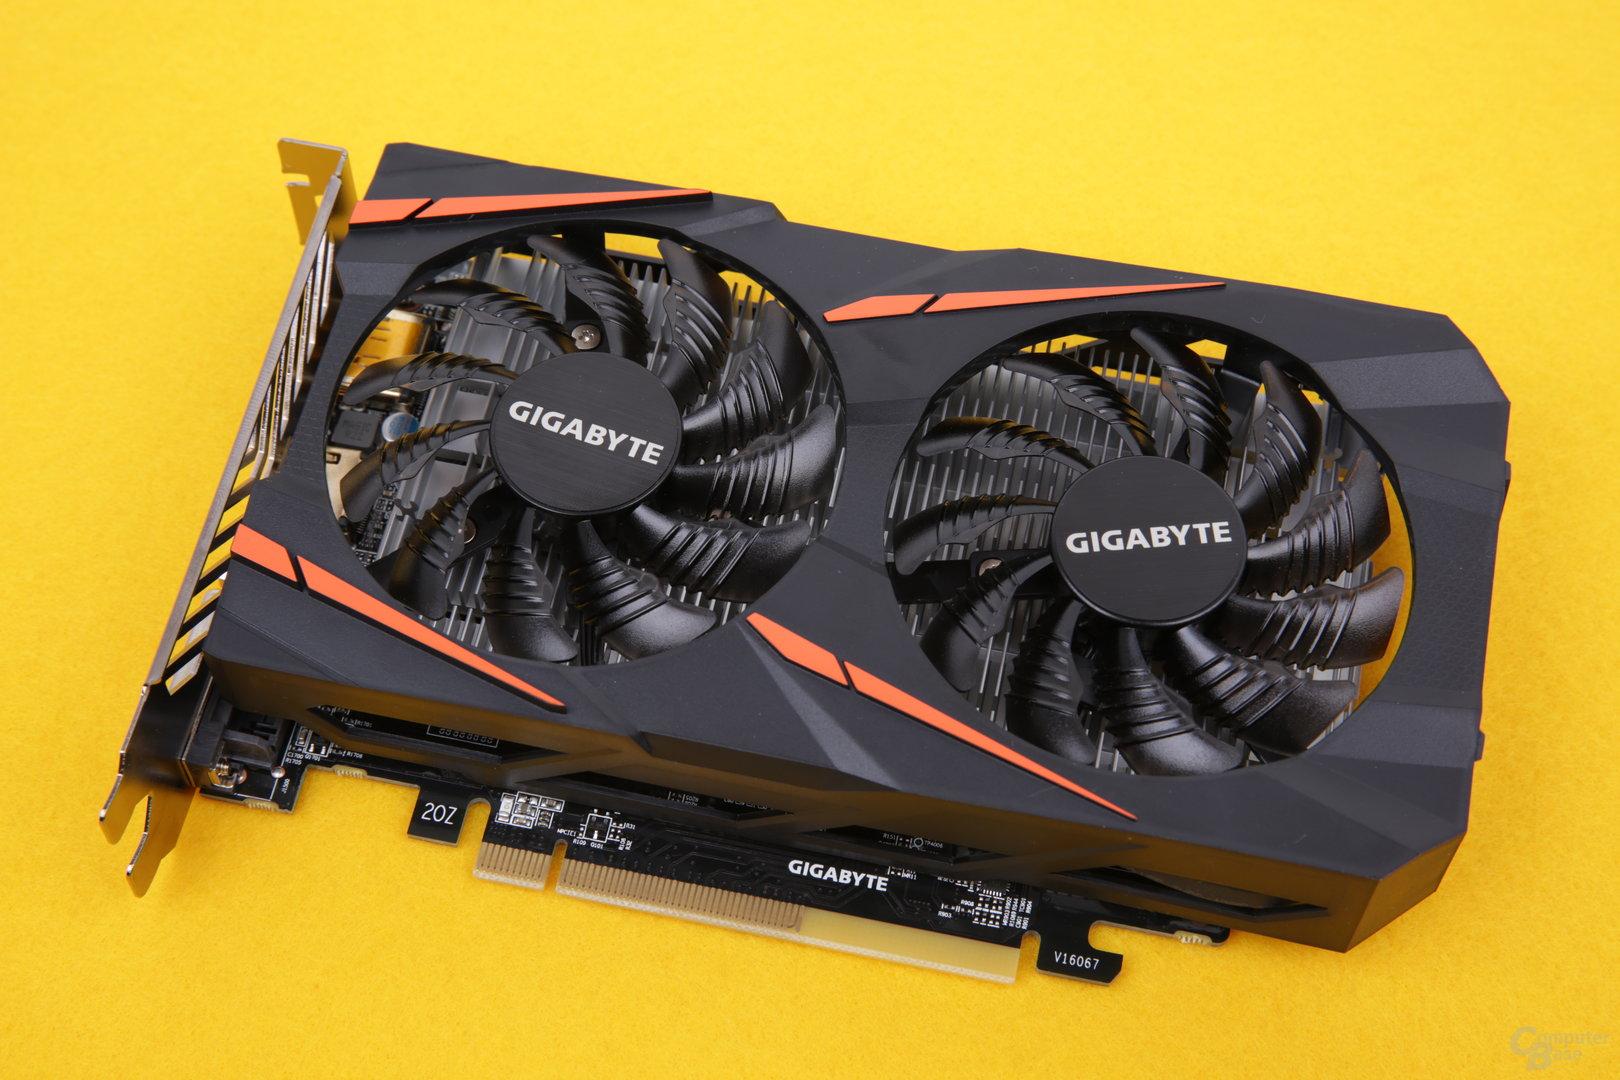 Gigabyte Radeon RX 460 WindForce OC